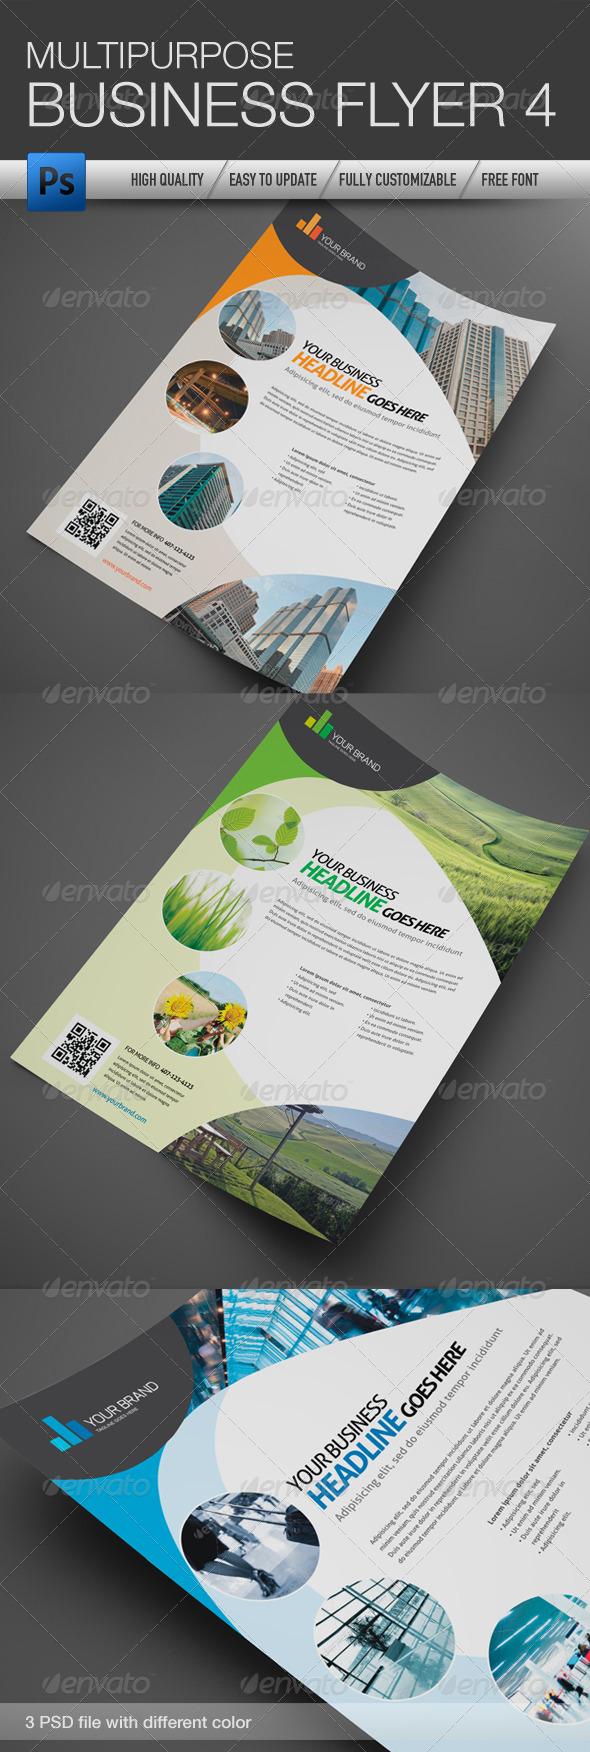 Multipurpose Business Flyer 4 - Corporate Flyers